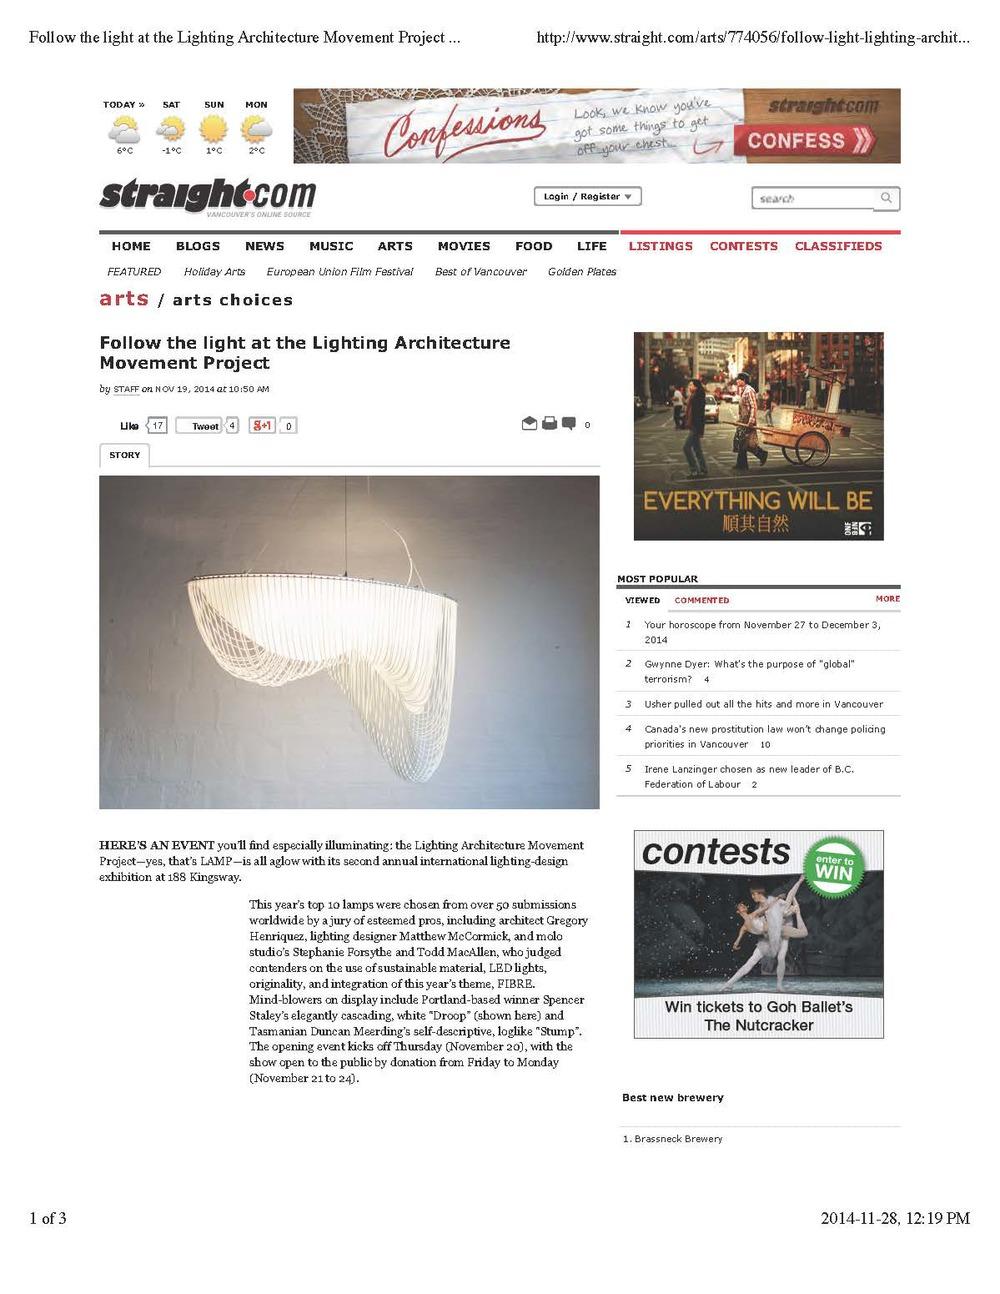 LAMP 2014 Press Kit_Page_16.jpg